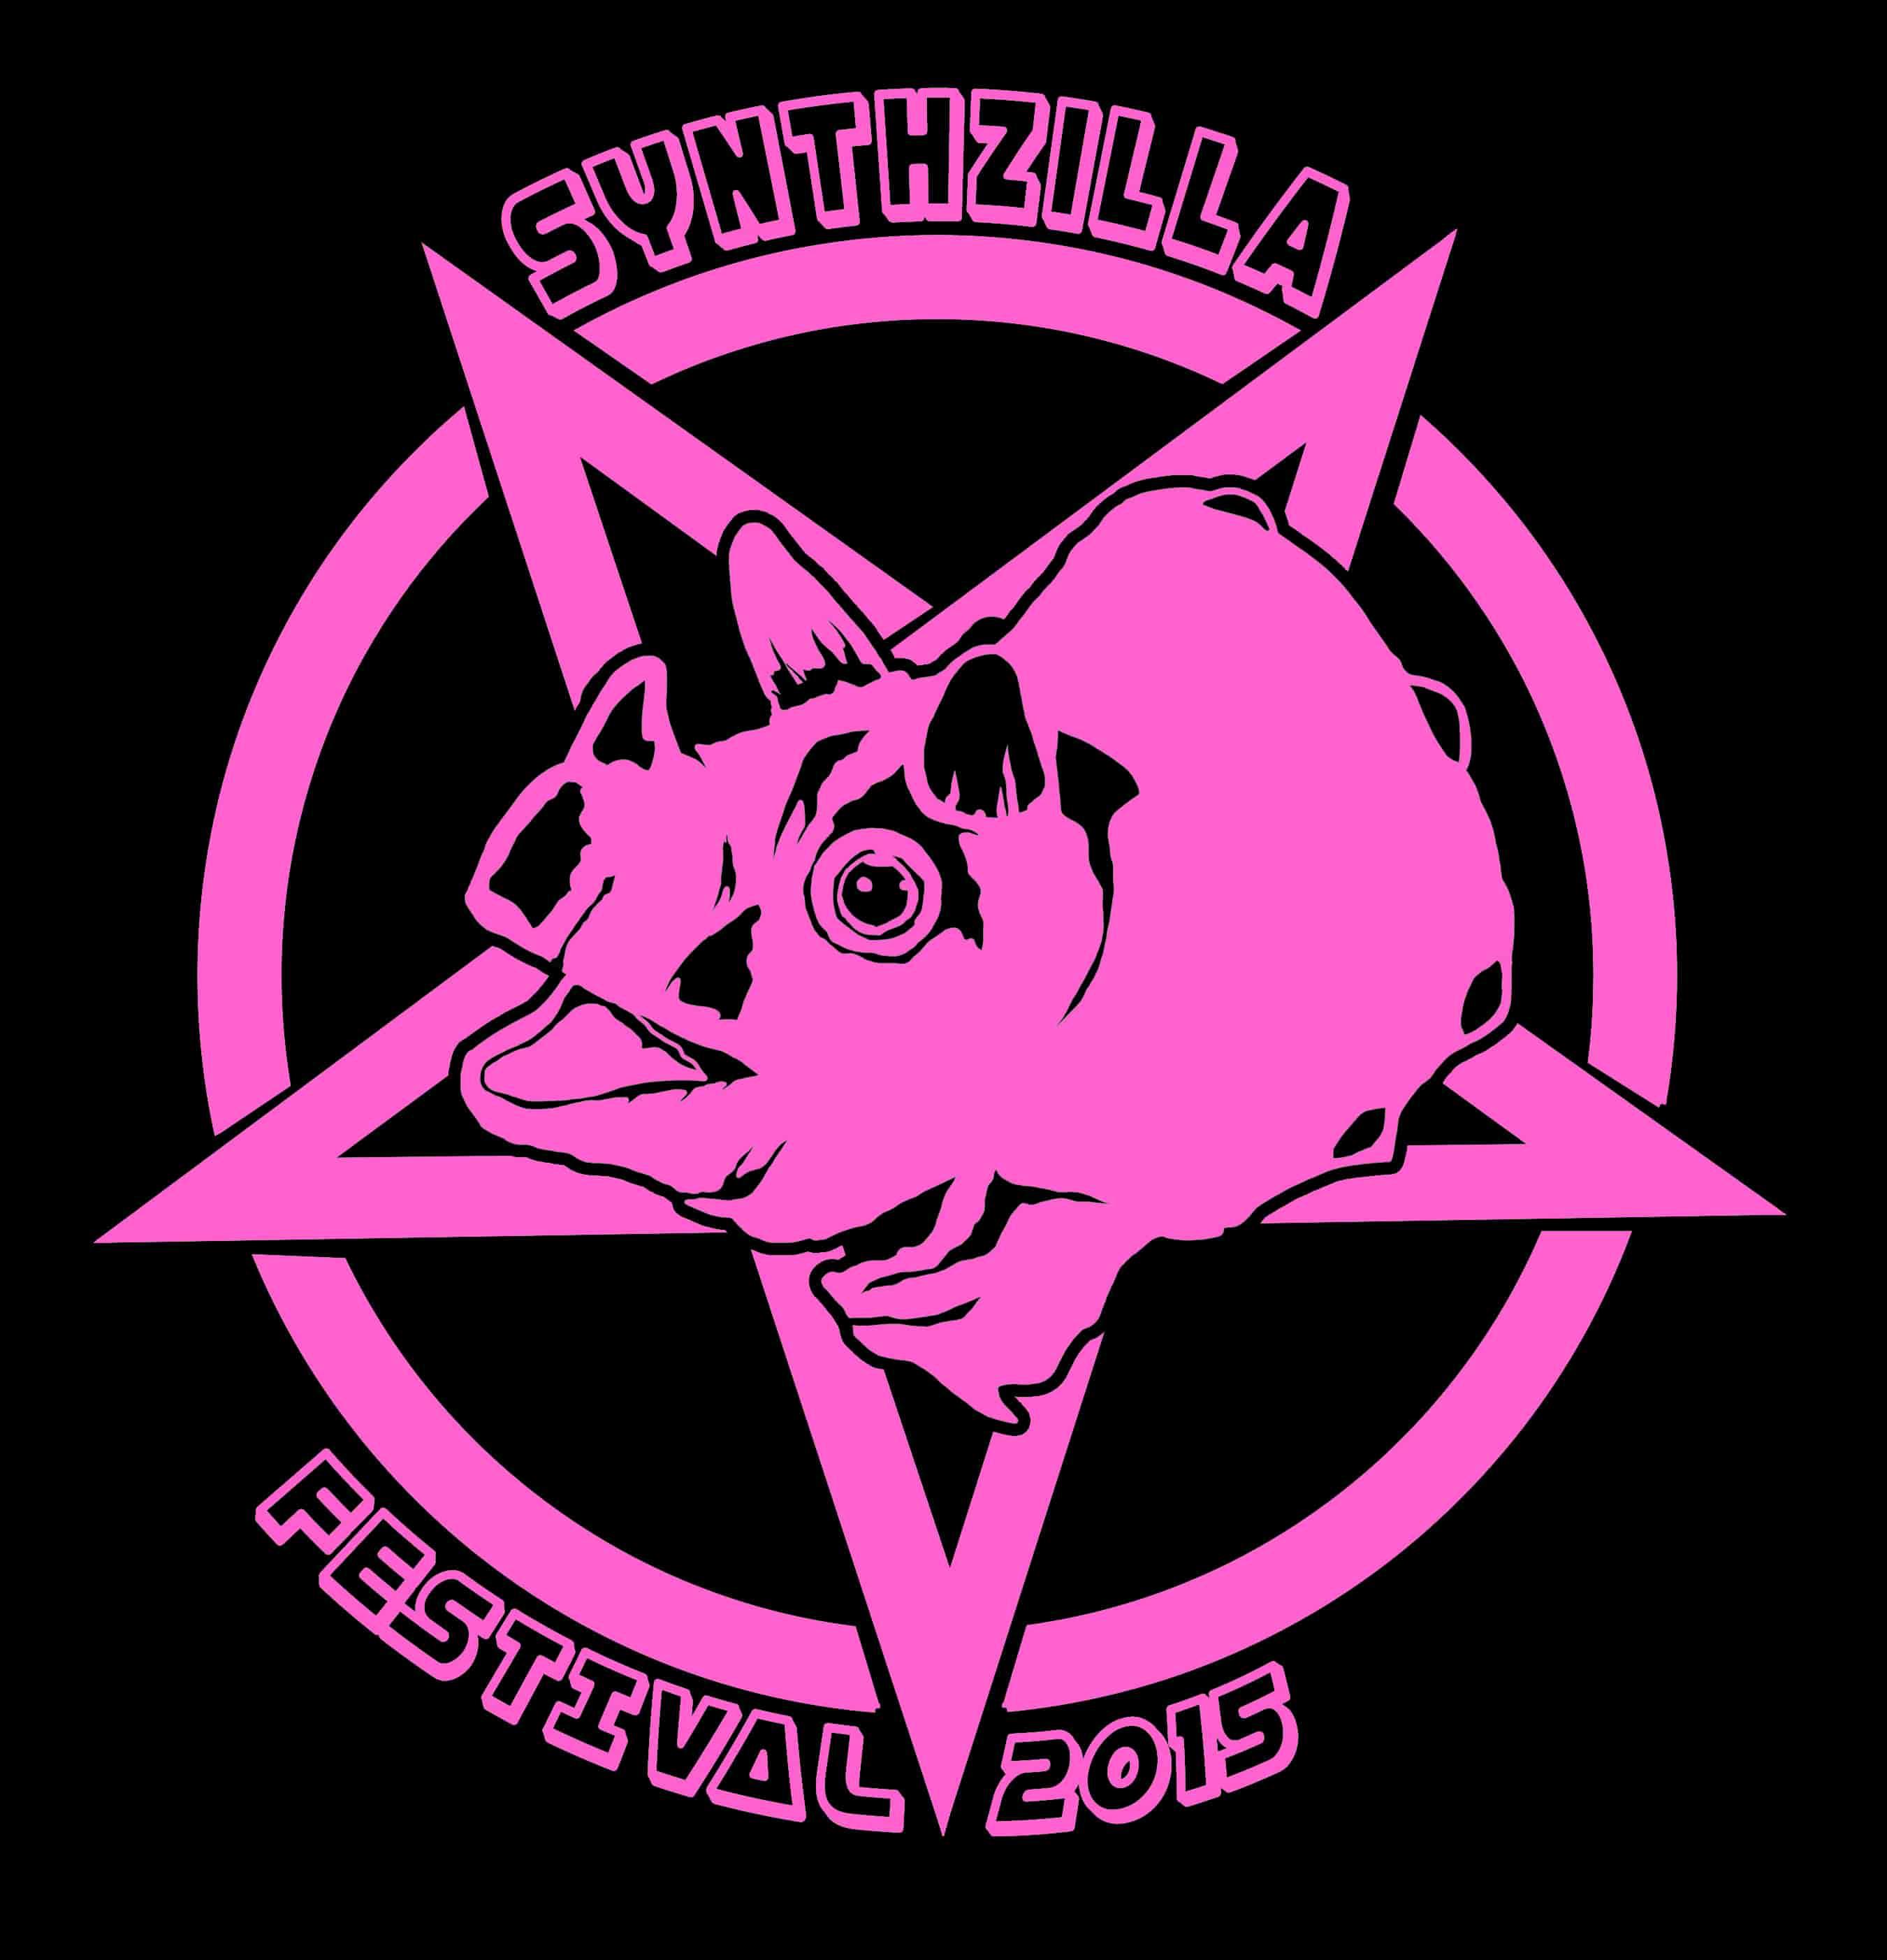 Synthzilla project